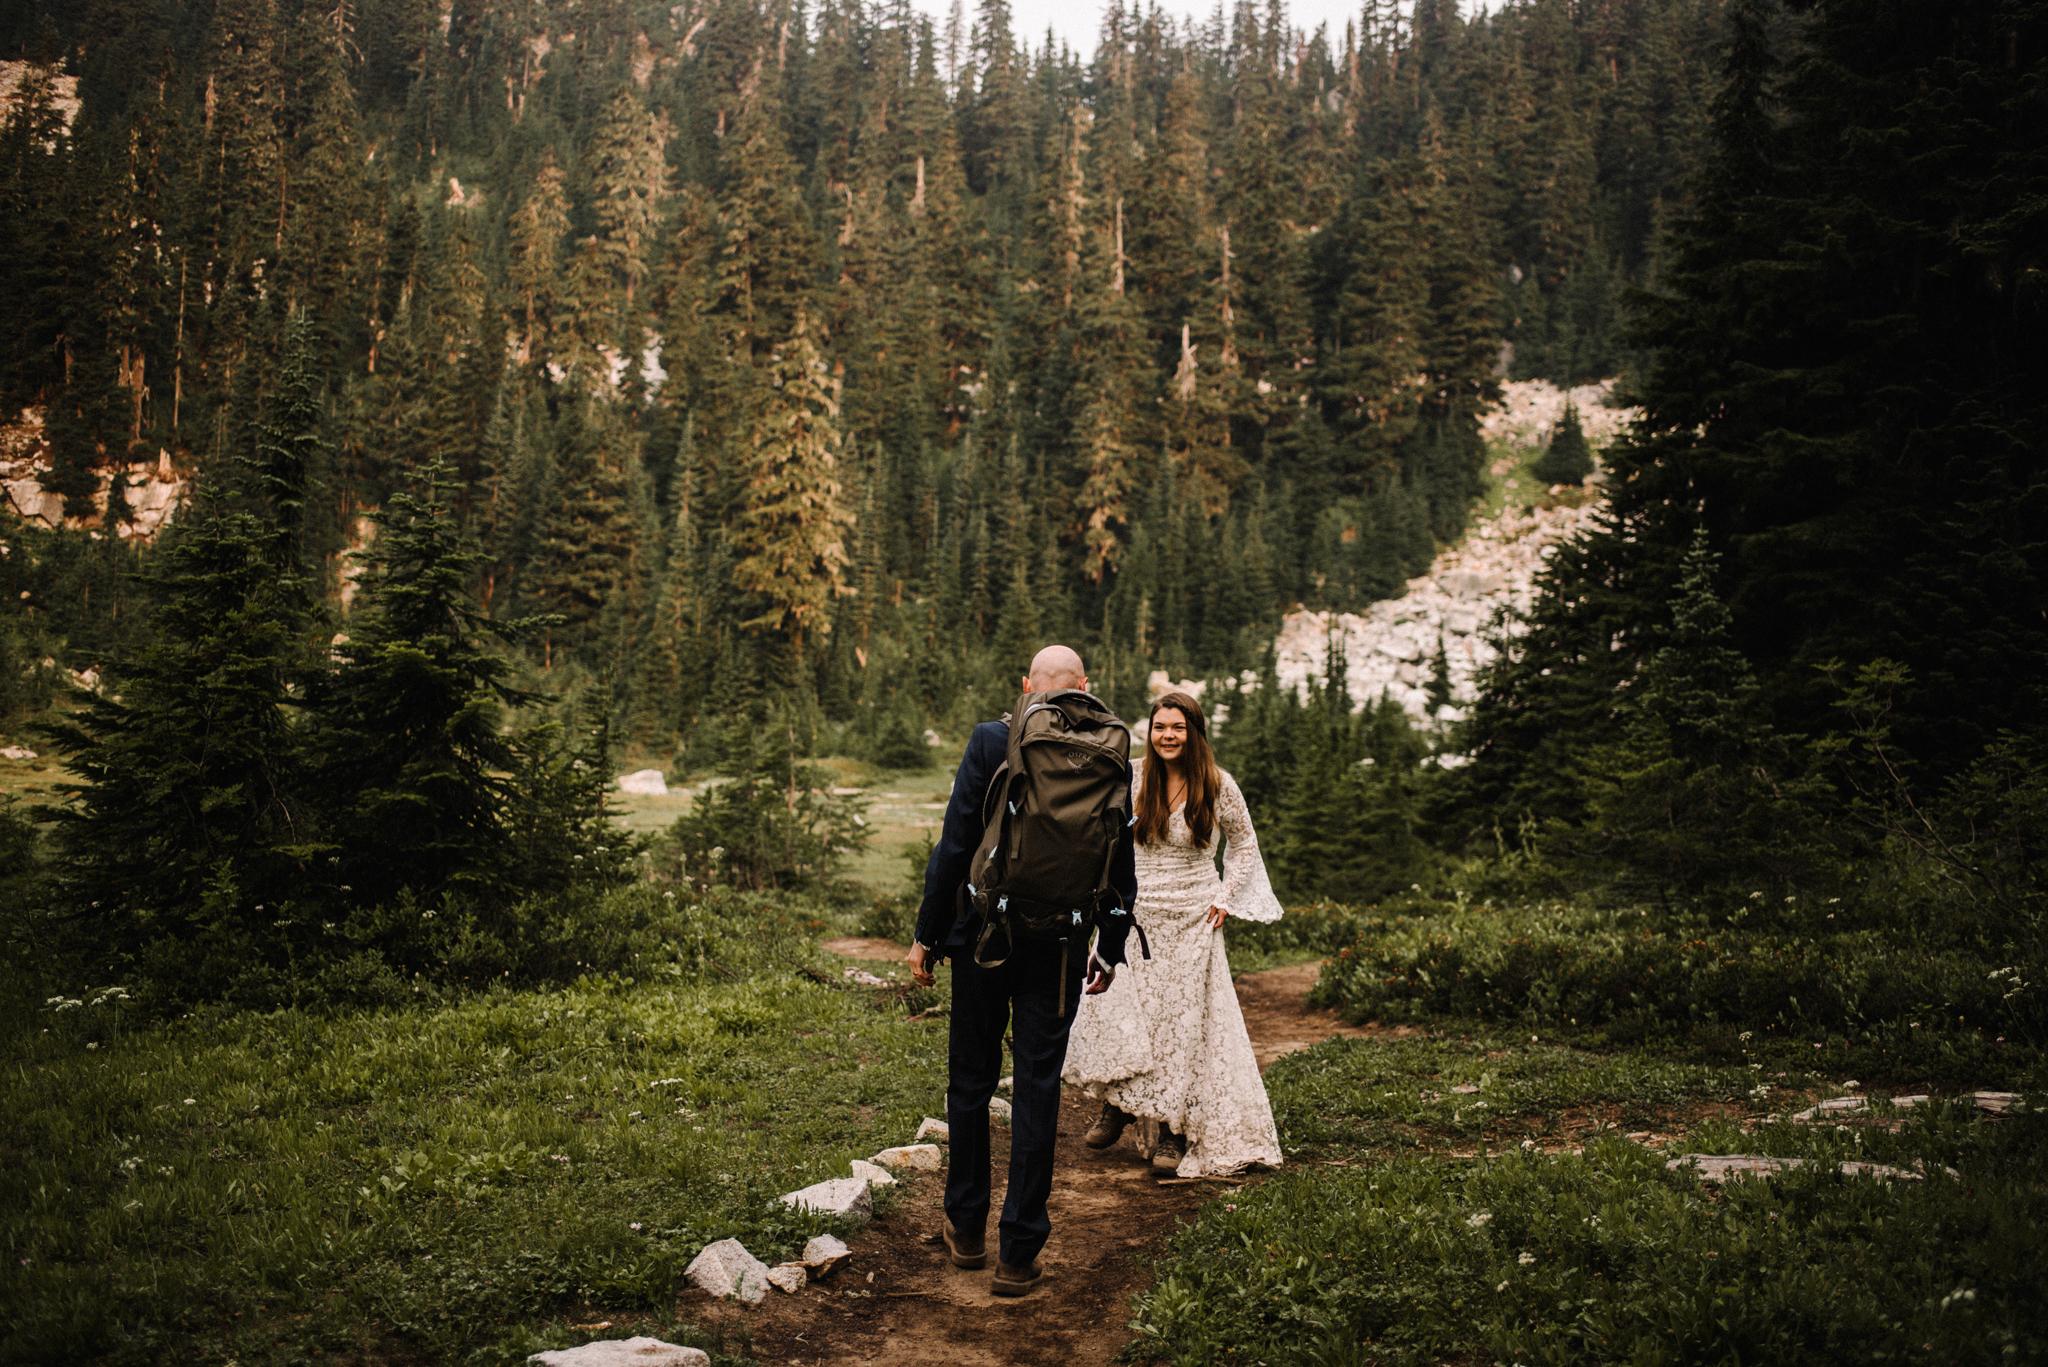 Megan and Andrew Lake Valhalla Washington PNW Adventure Elopement White Sails Creative Sunrise Hike_67.JPG